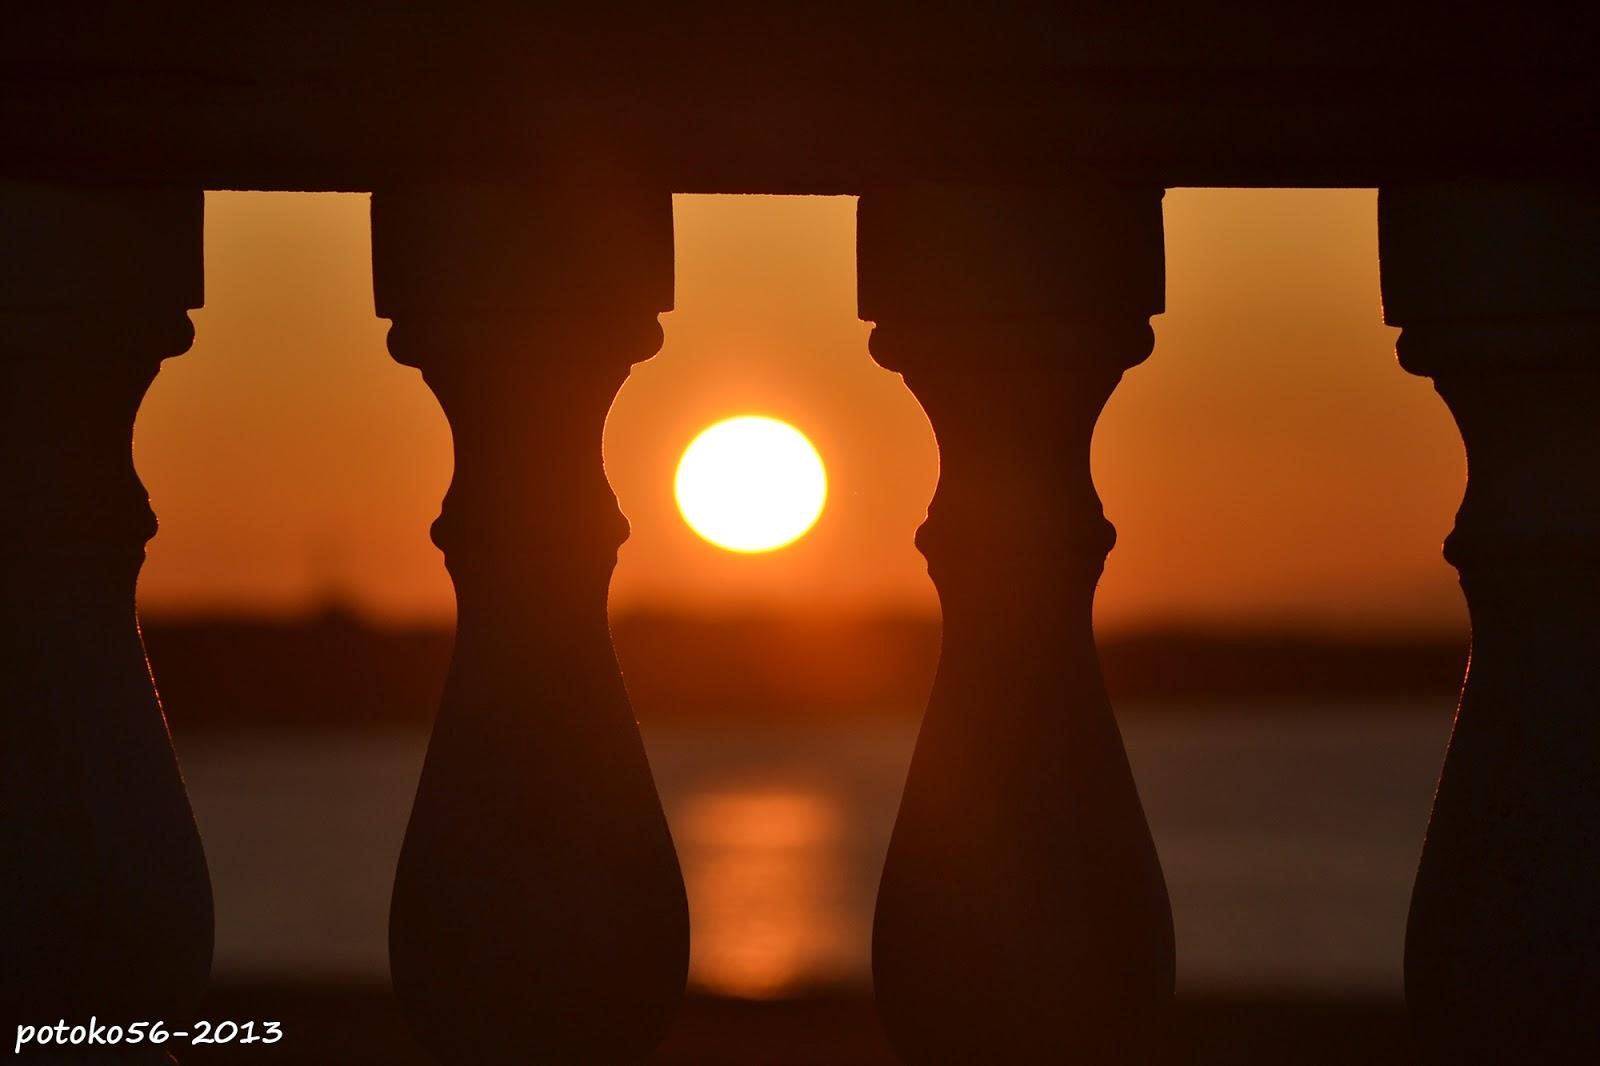 el sol saliendo visto desde la balustrada Rota